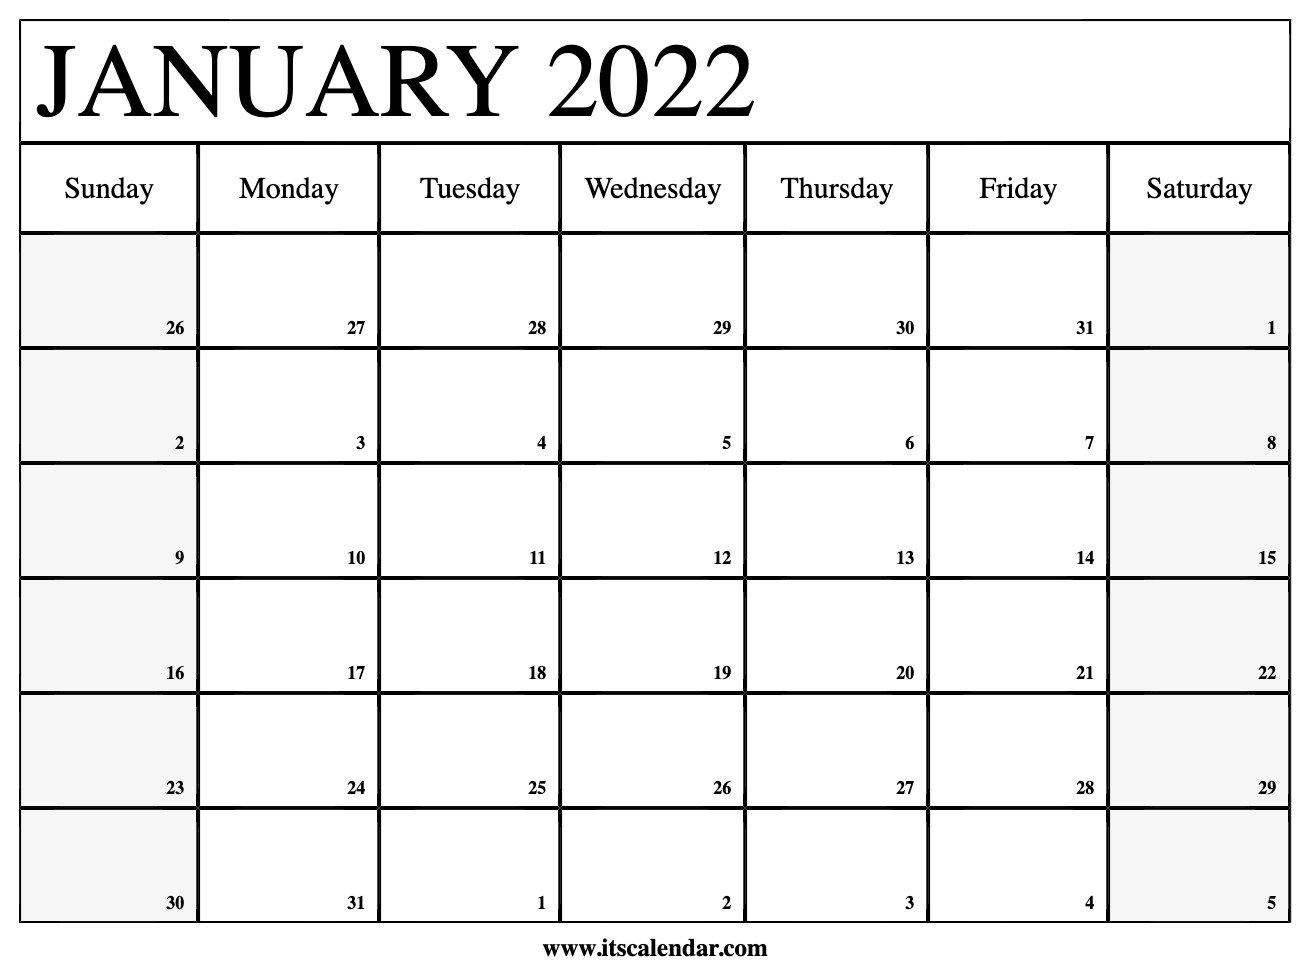 Free Printable January 2022 Calendar pertaining to Planner 2022 Printable Goal